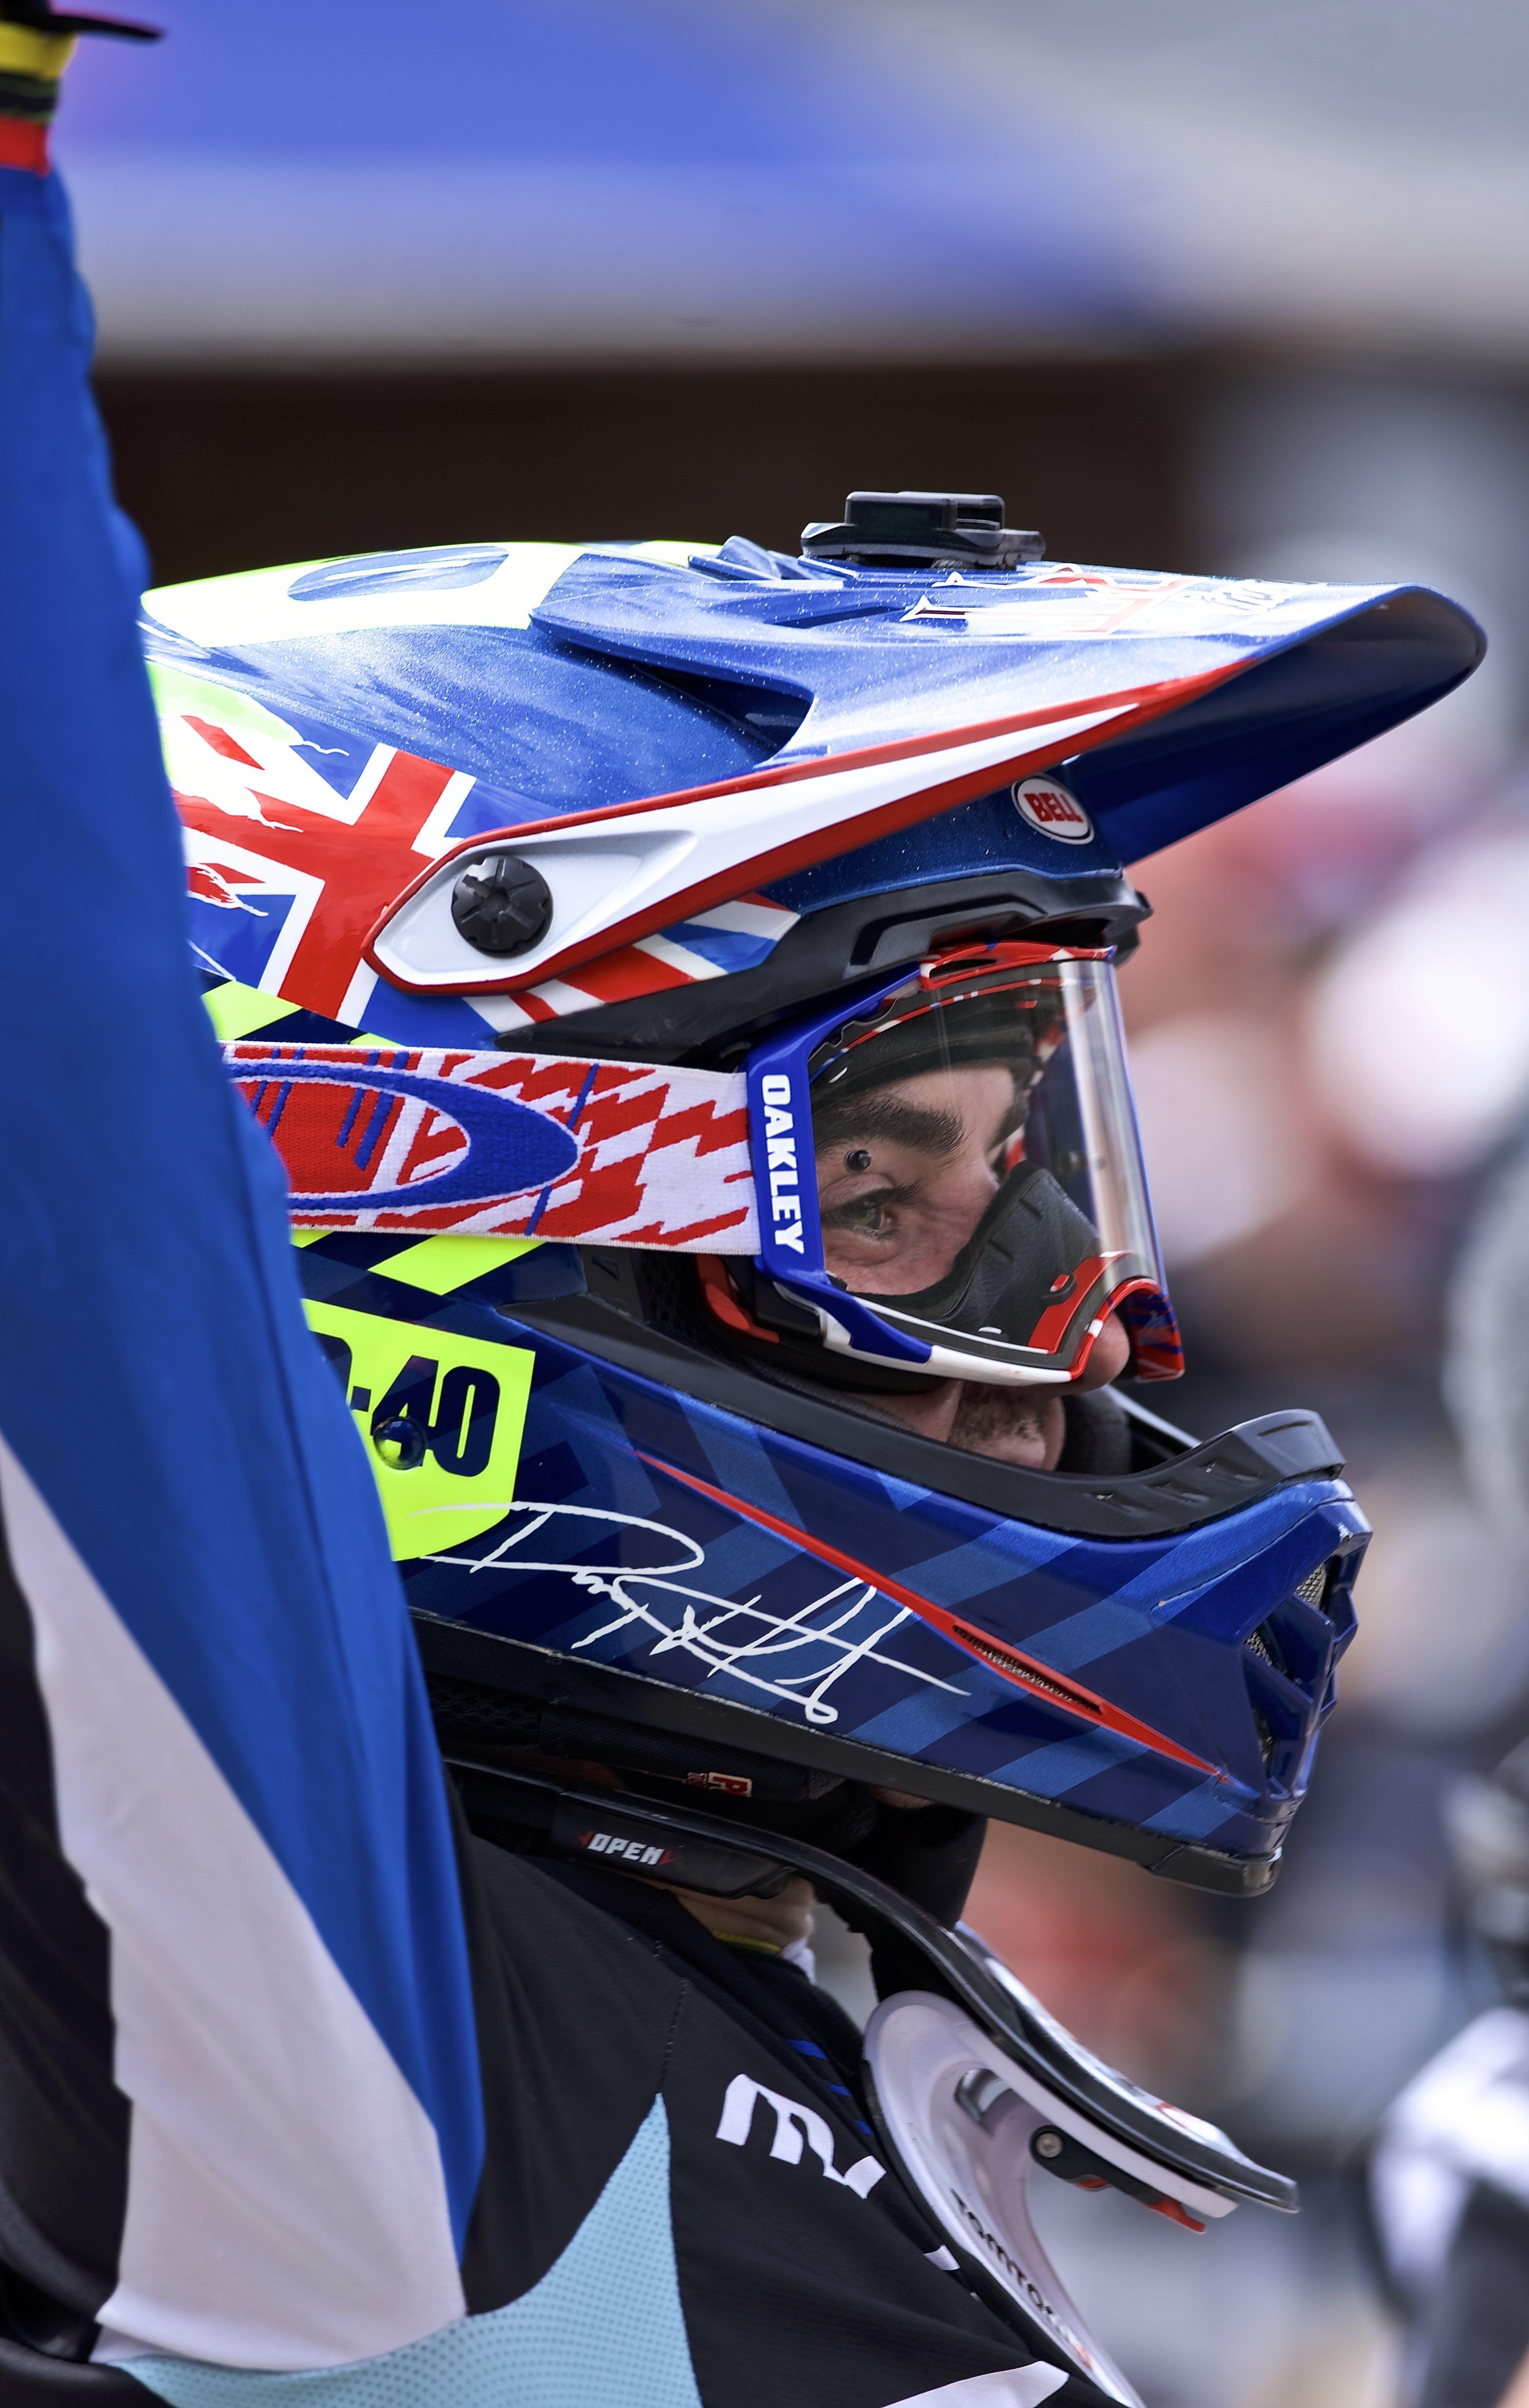 danny hart downhill worldcup lenzerheide 2016 winner